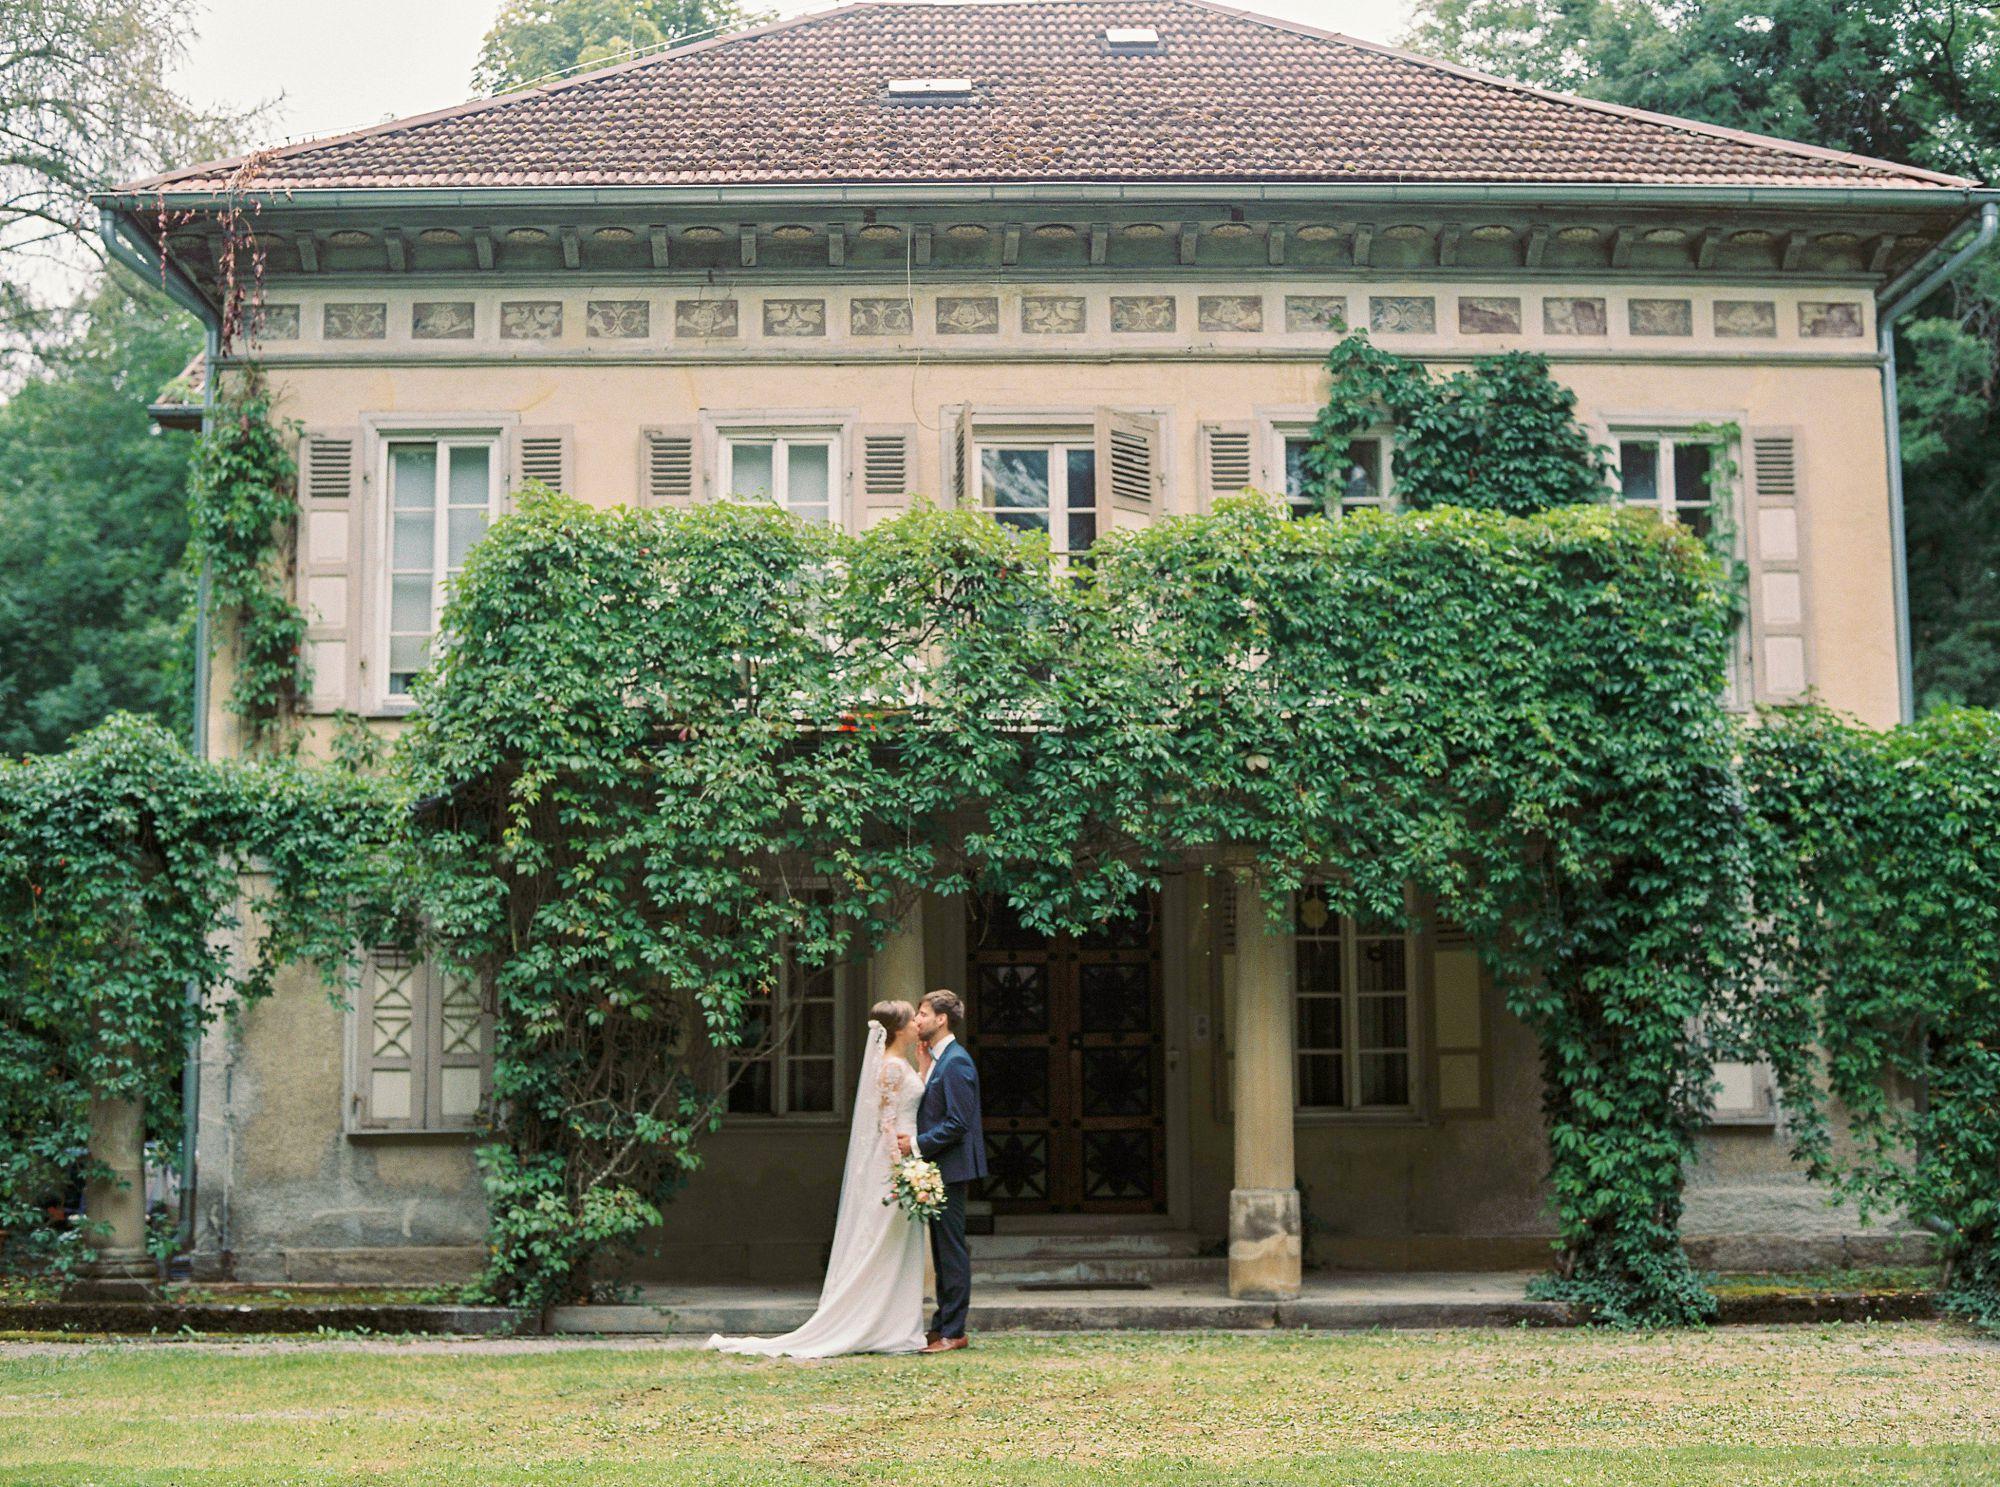 2000-katja-scherle-festtagsfotografien_berlin-hamburg-filmweddingphotographer-hochzeitsfotograf-tubingen_0015